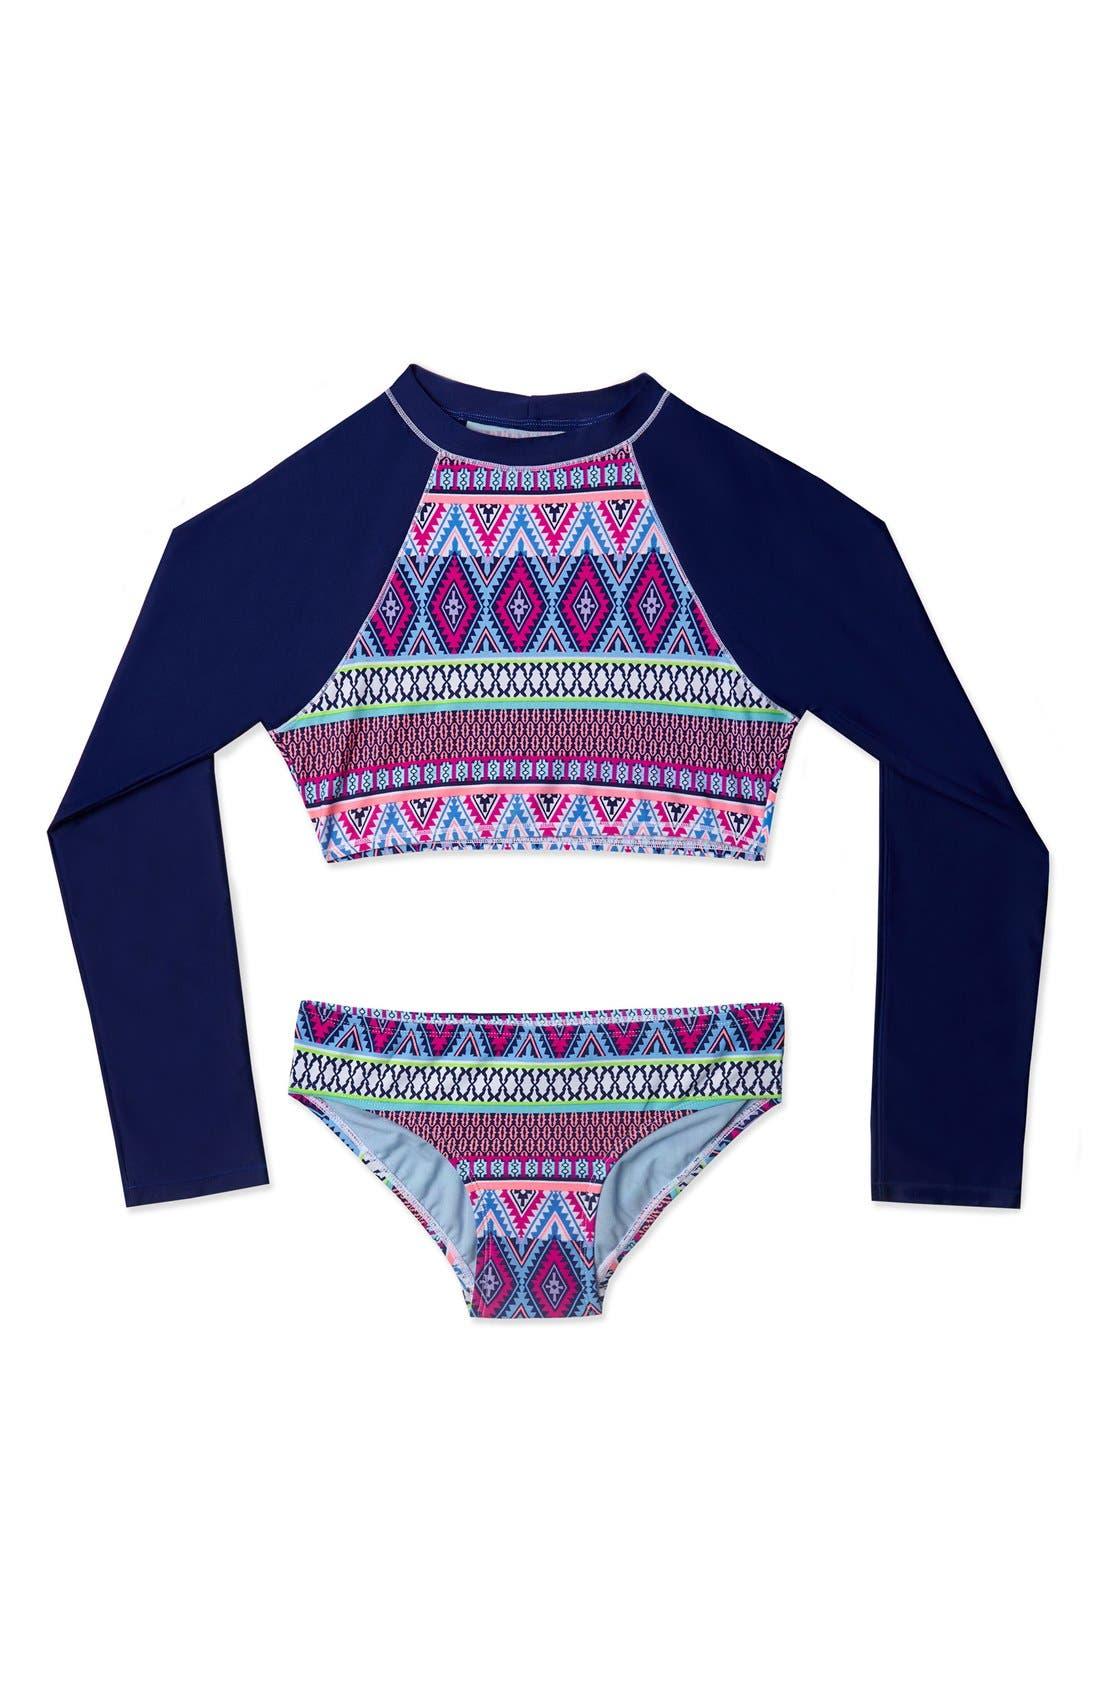 Main Image - Gossip Girl 'Stripe Fusion' Two-Piece Rashguard Swimsuit (Big Girls)